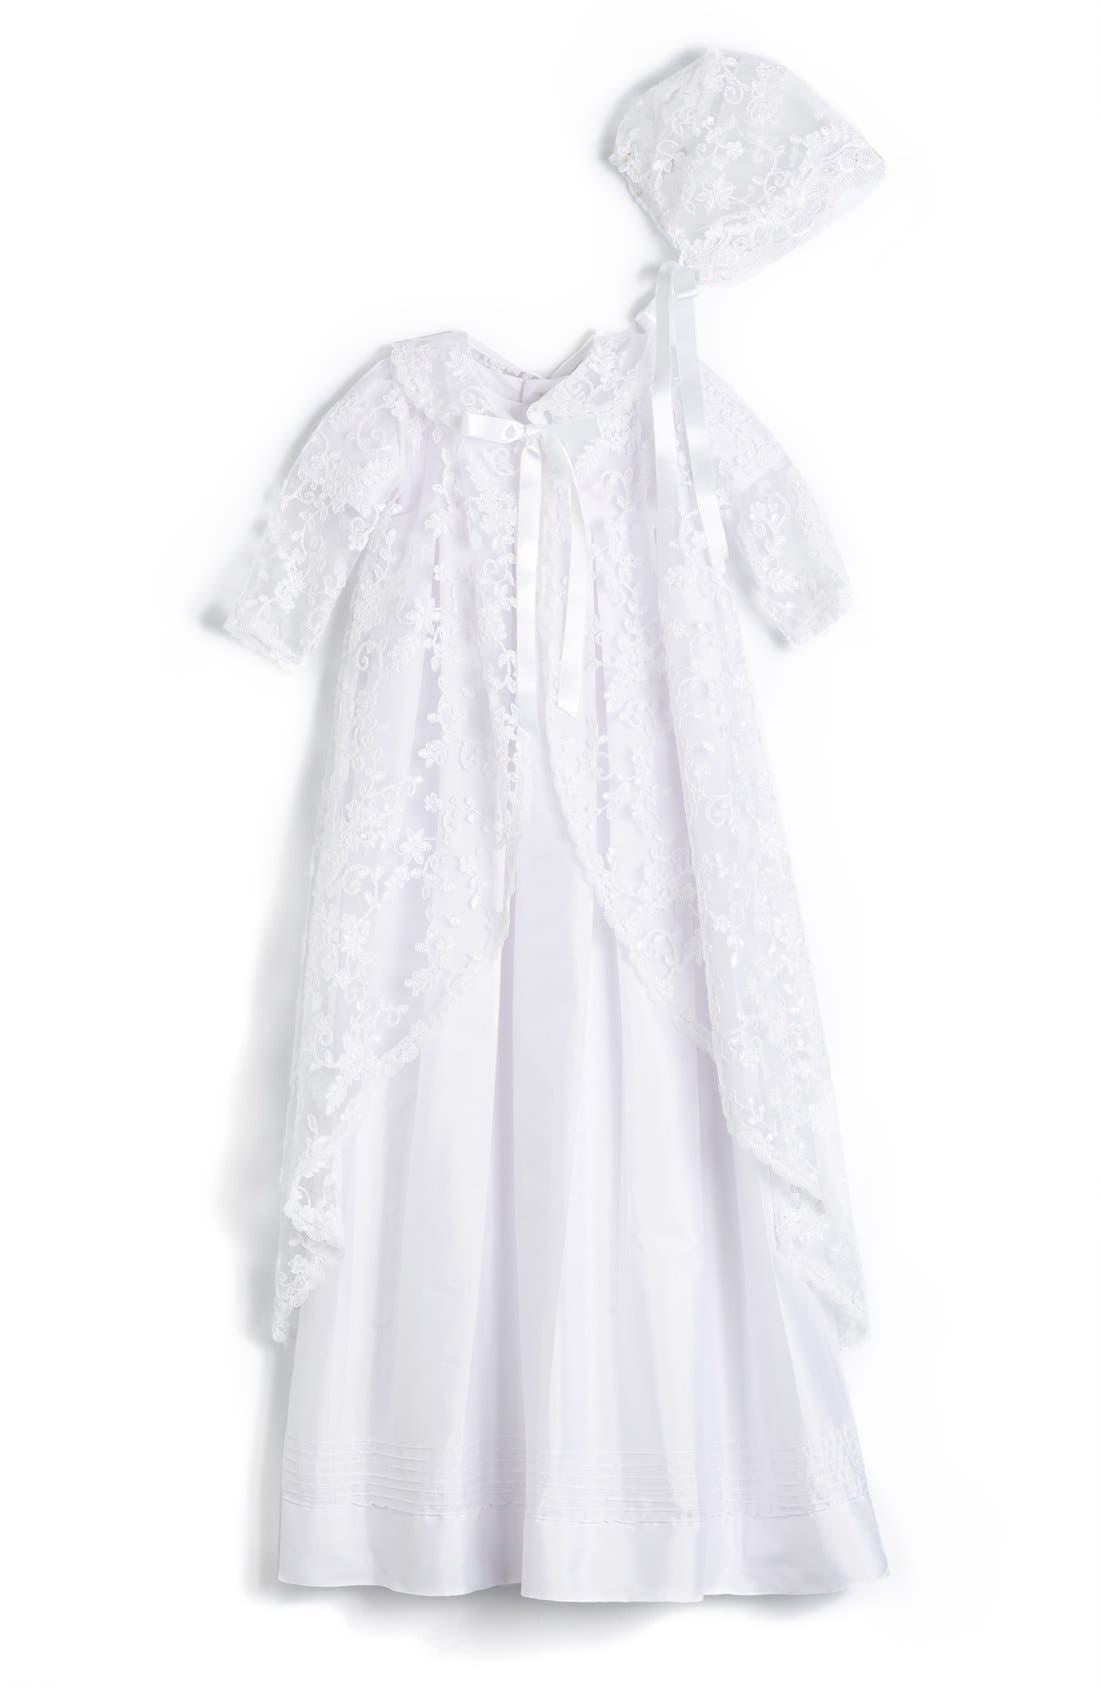 Isabel Garreton 'Renaissance' Christening Gown & Bonnet (Baby)